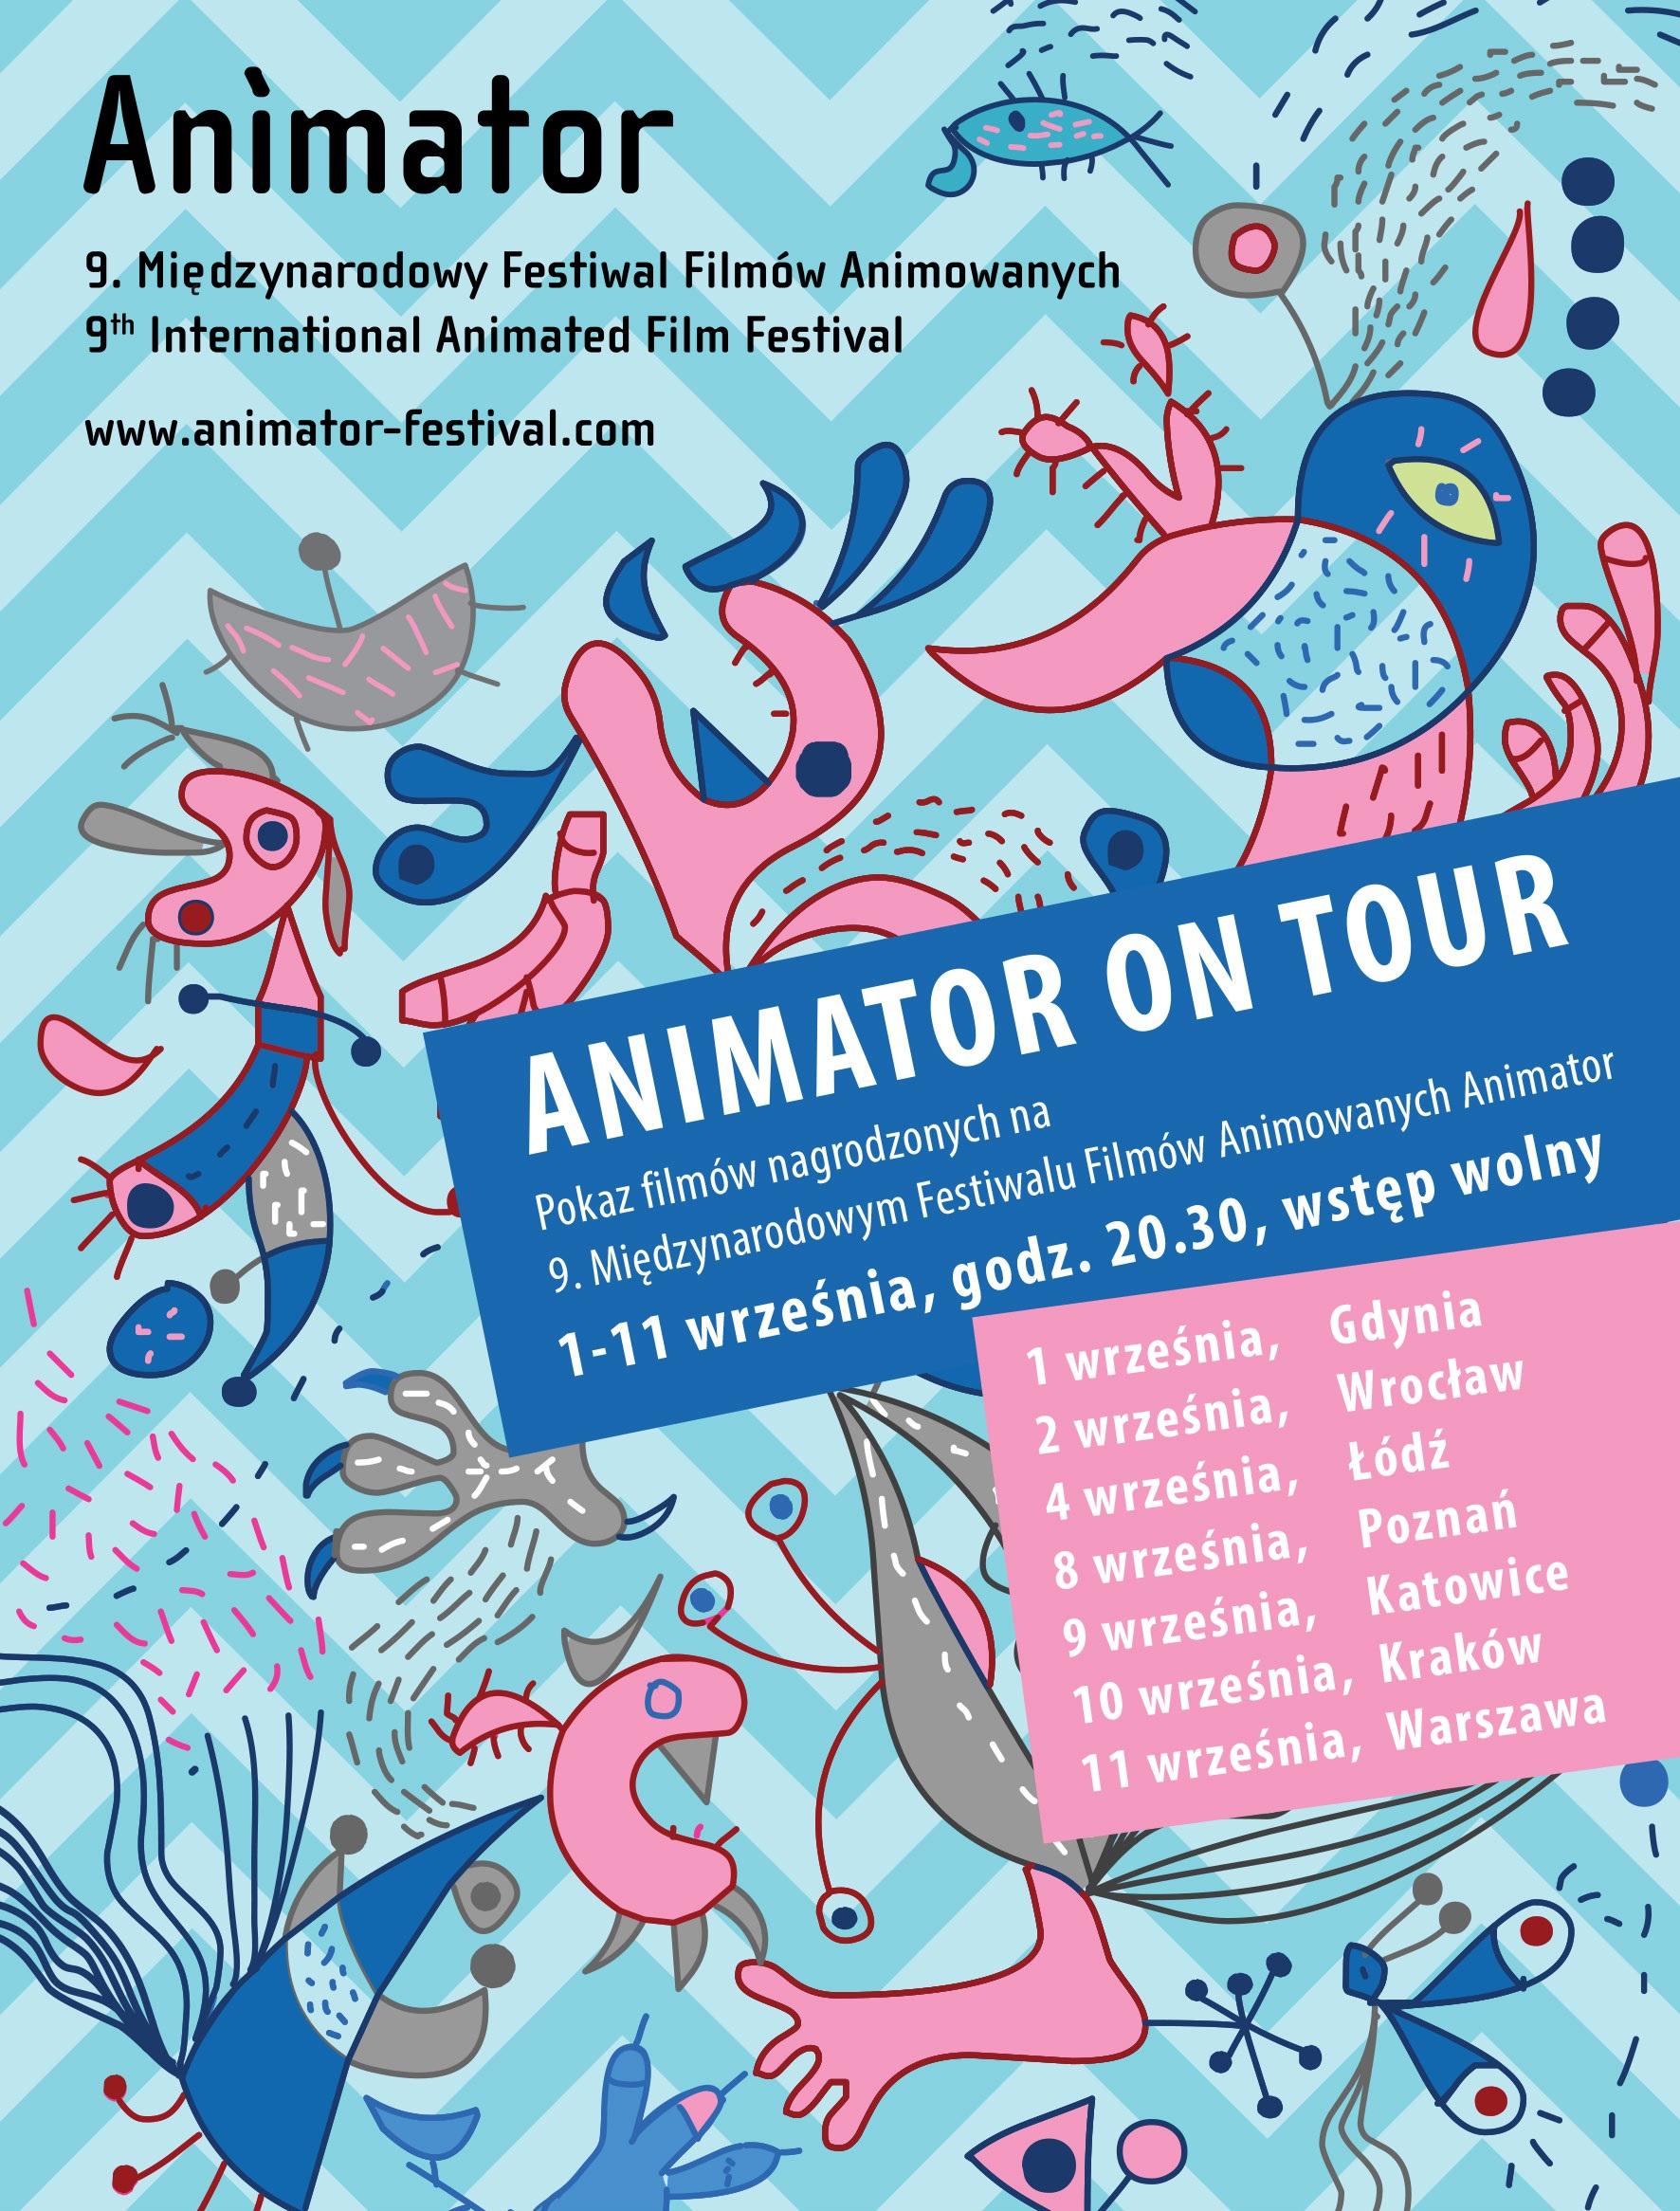 """Animator on Tour"" (źródło: materiały prasowe organizatora)"